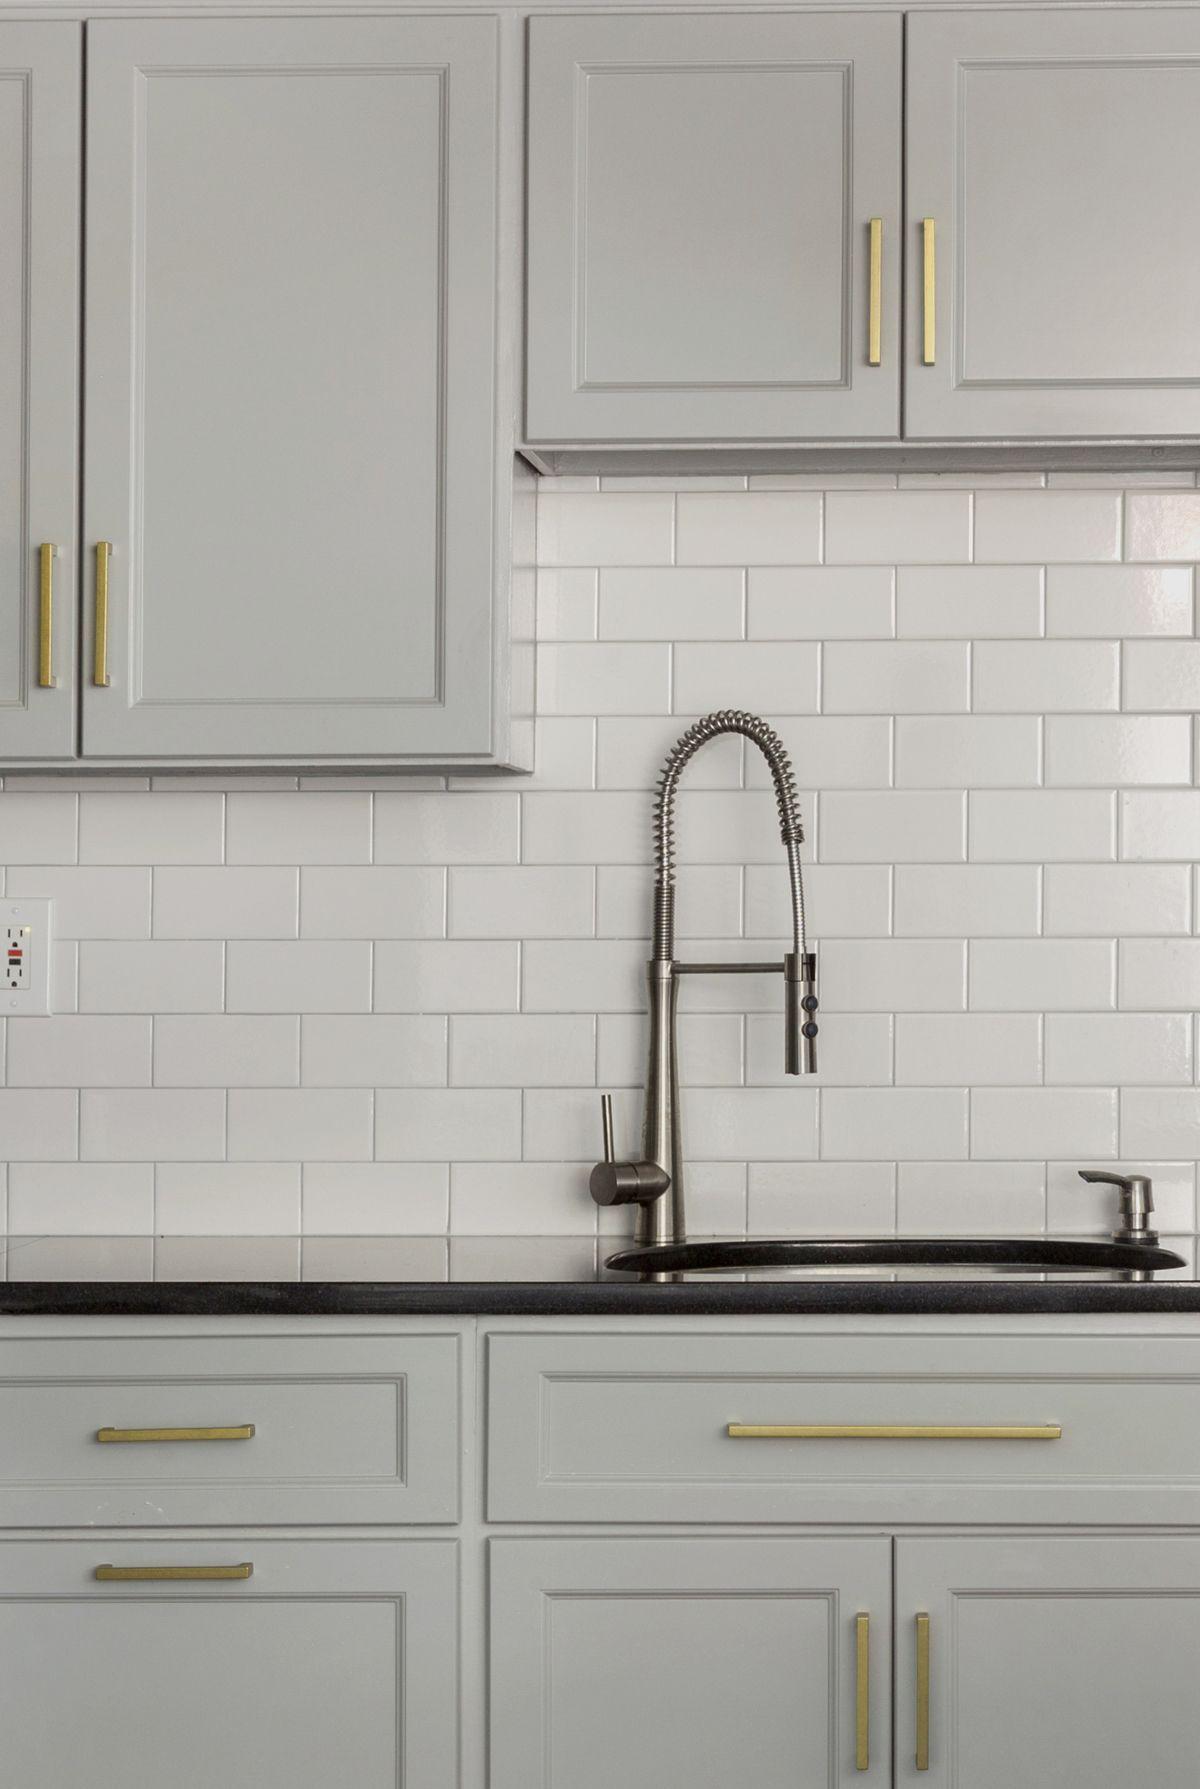 glamorous gray kitchens my huisie eendag kitchen kitchen